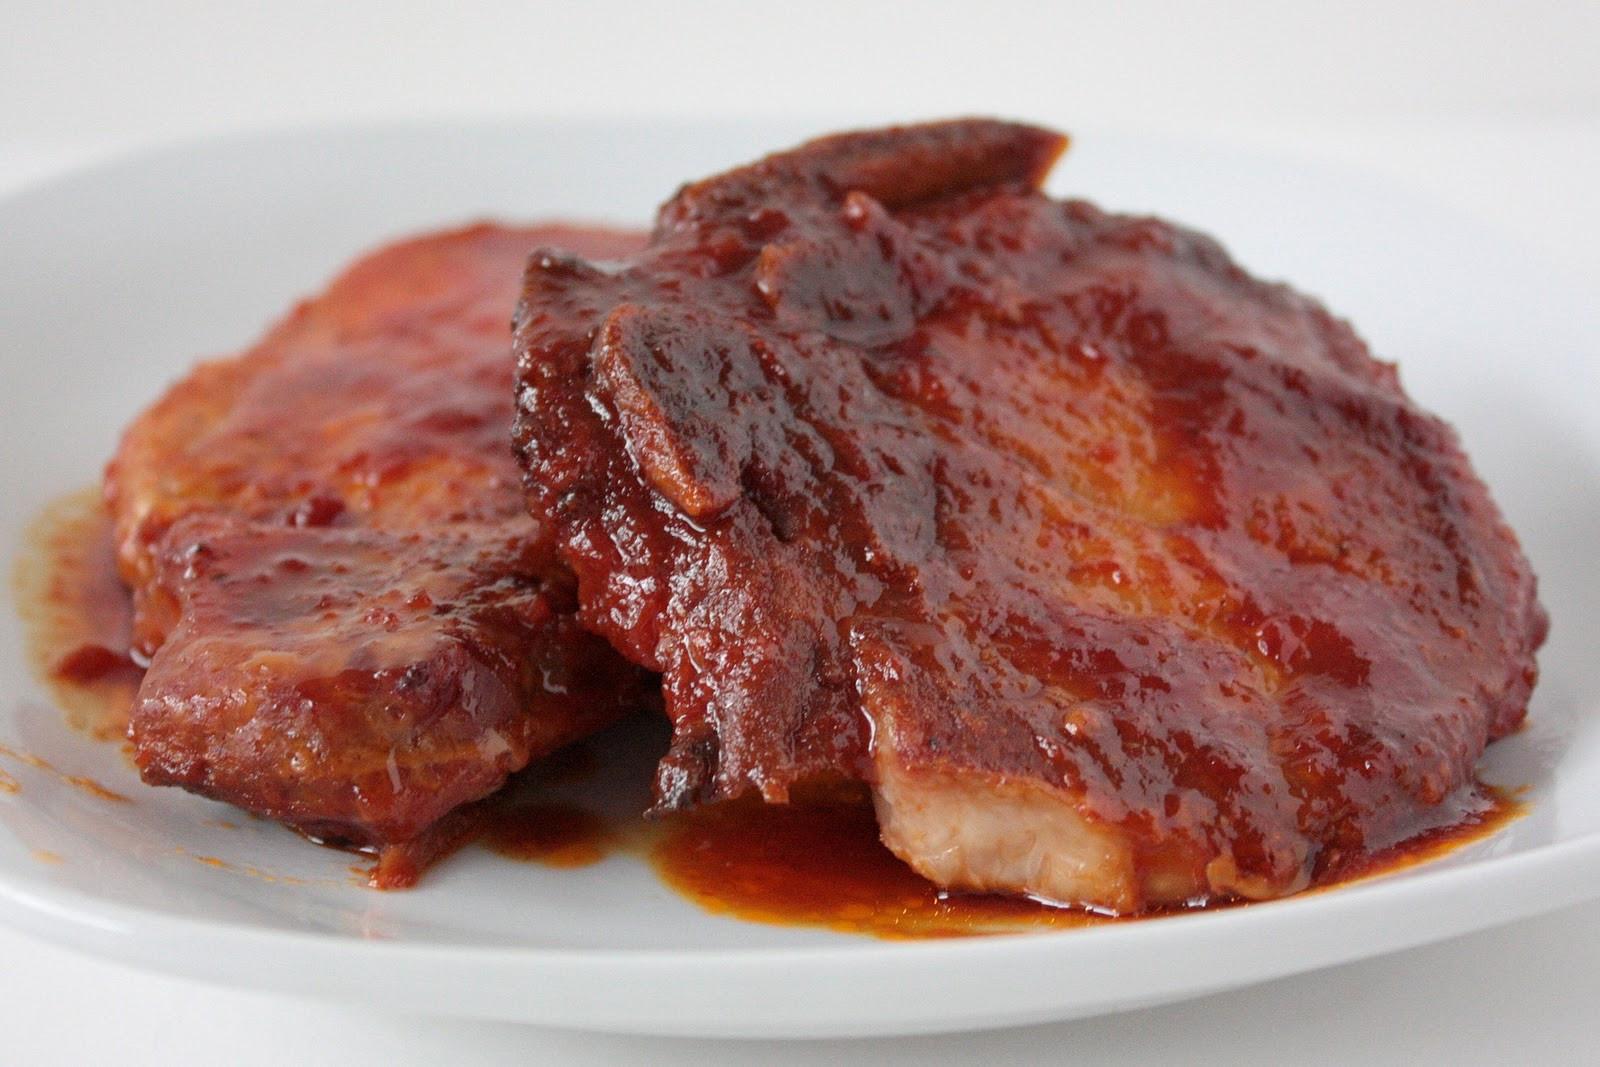 Crock Pot Bbq Pork Chops  Feeding My Picky Eaters Meal Plan Shopping the Freezer